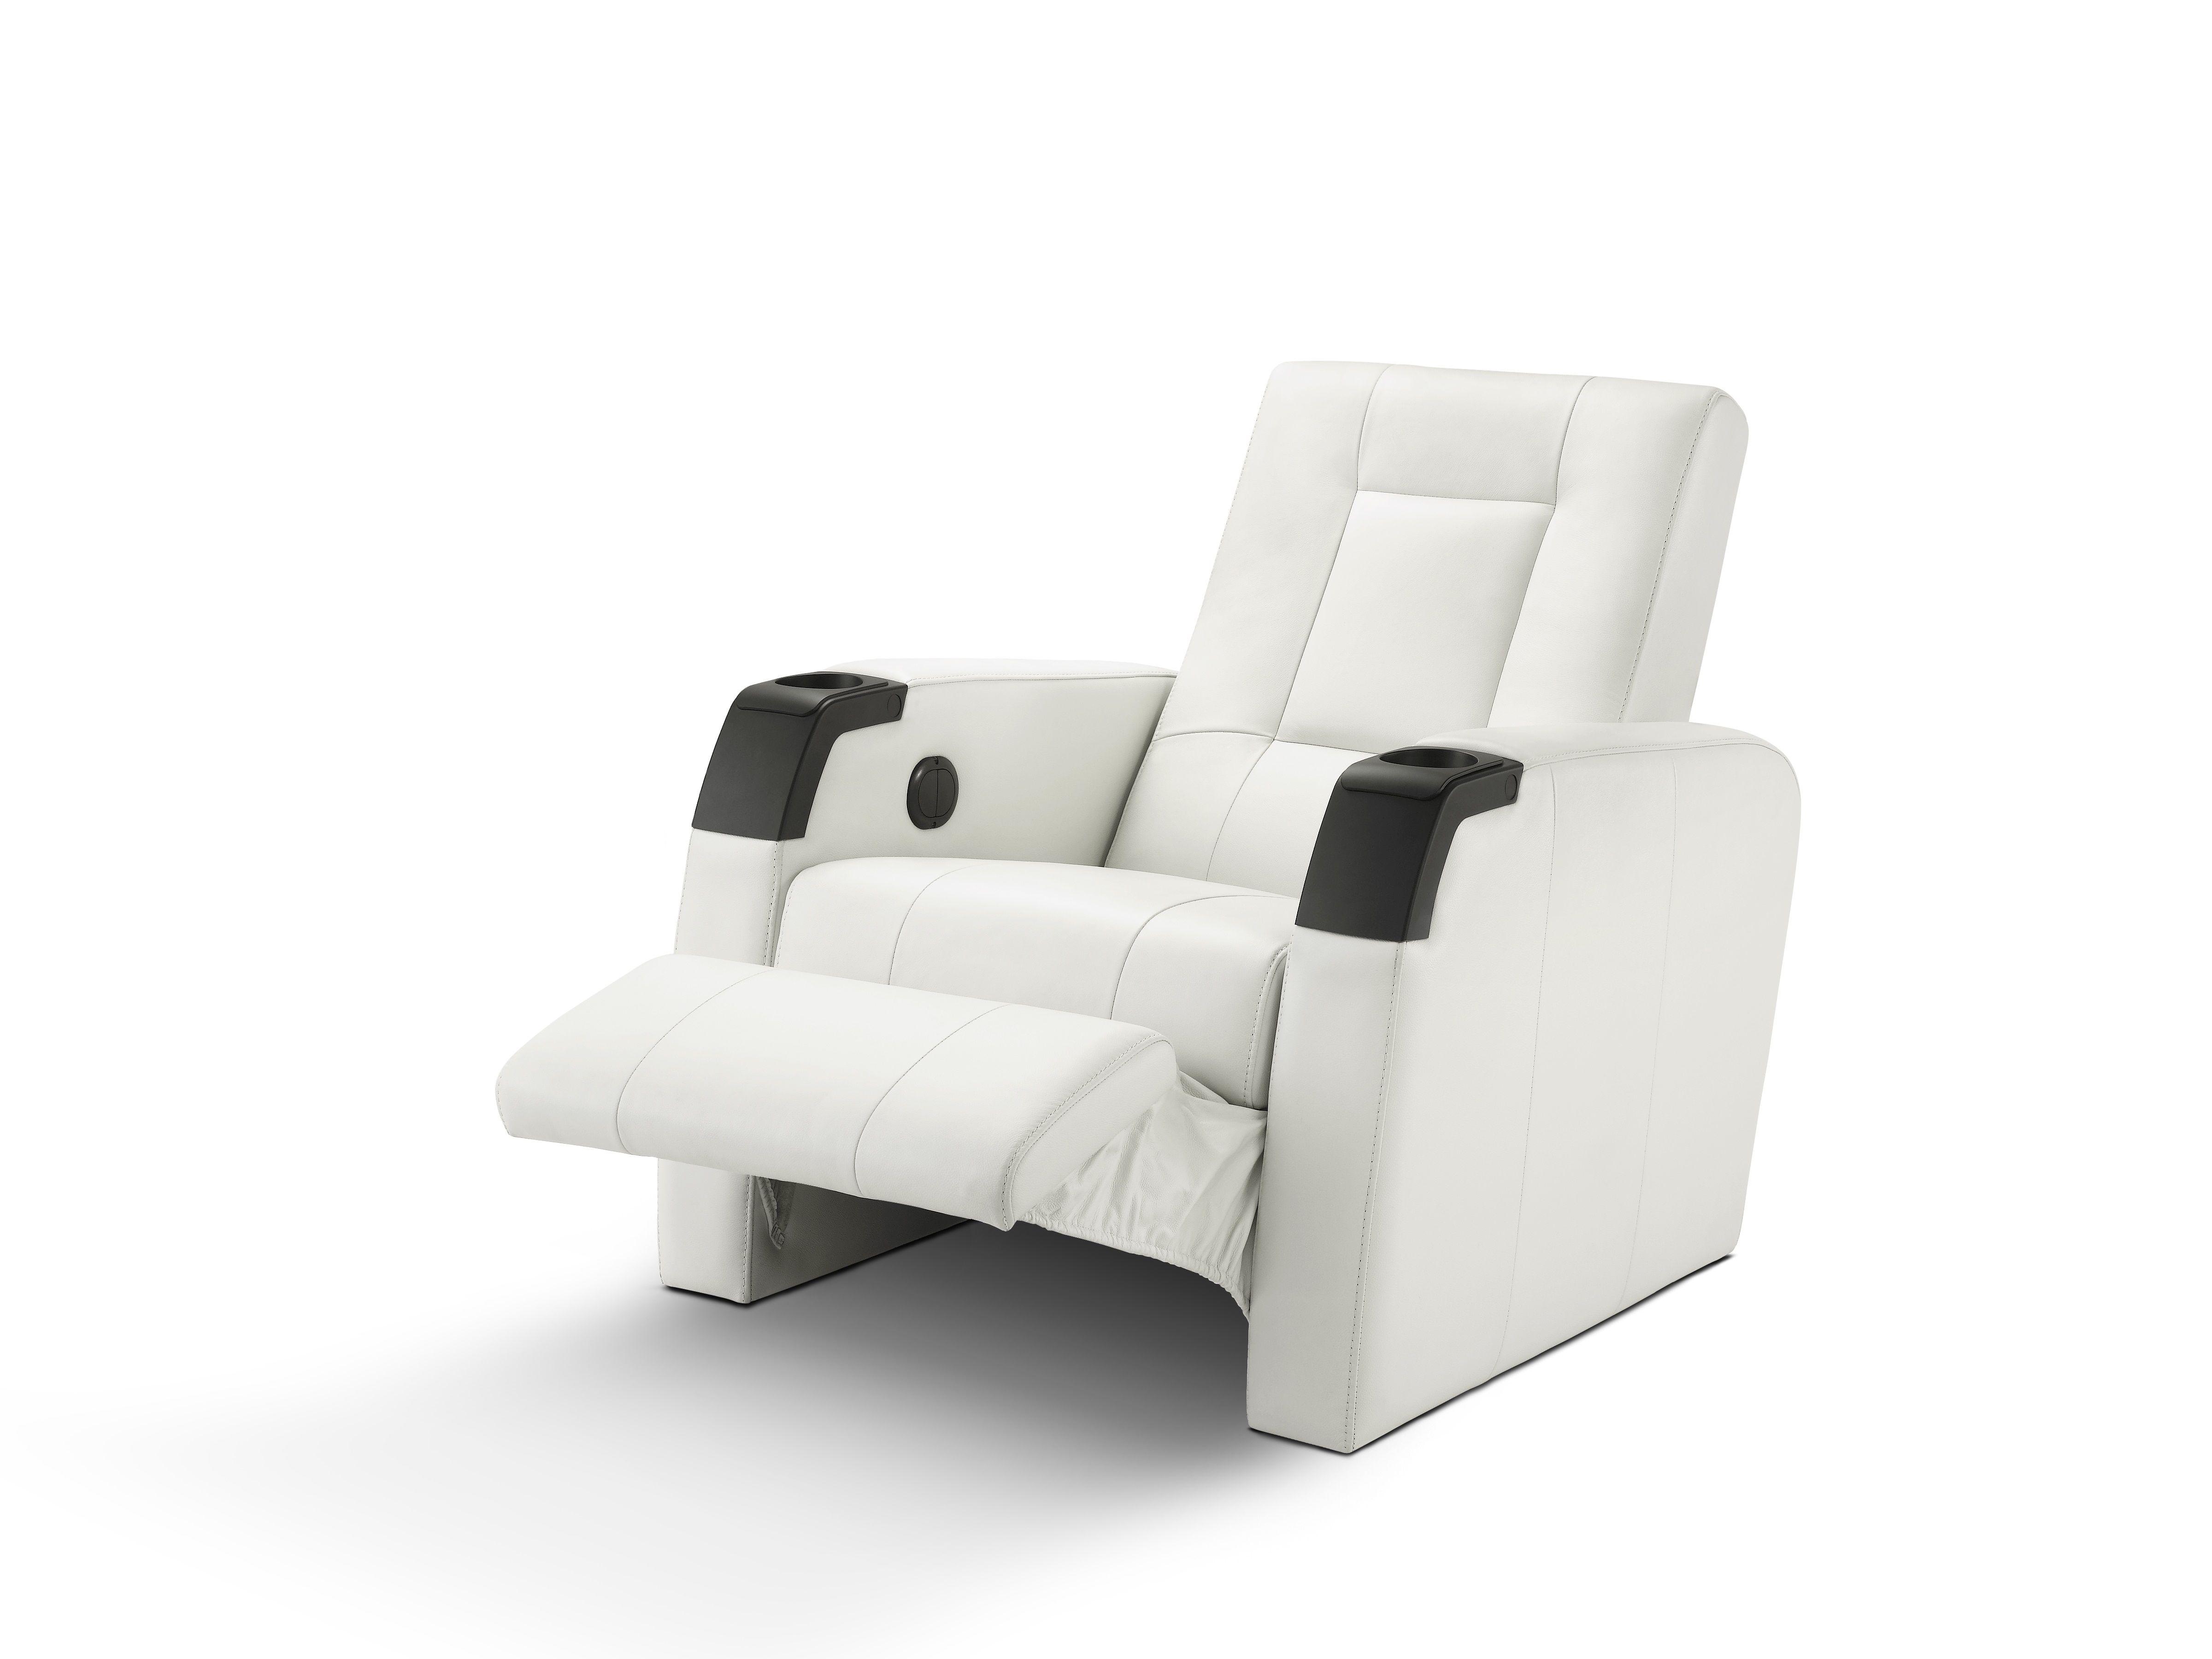 Premium Roma VIP reclining cinema single seat - in the reclining position  sc 1 st  Pinterest & Premium Roma VIP reclining cinema single seat - in the reclining ... islam-shia.org